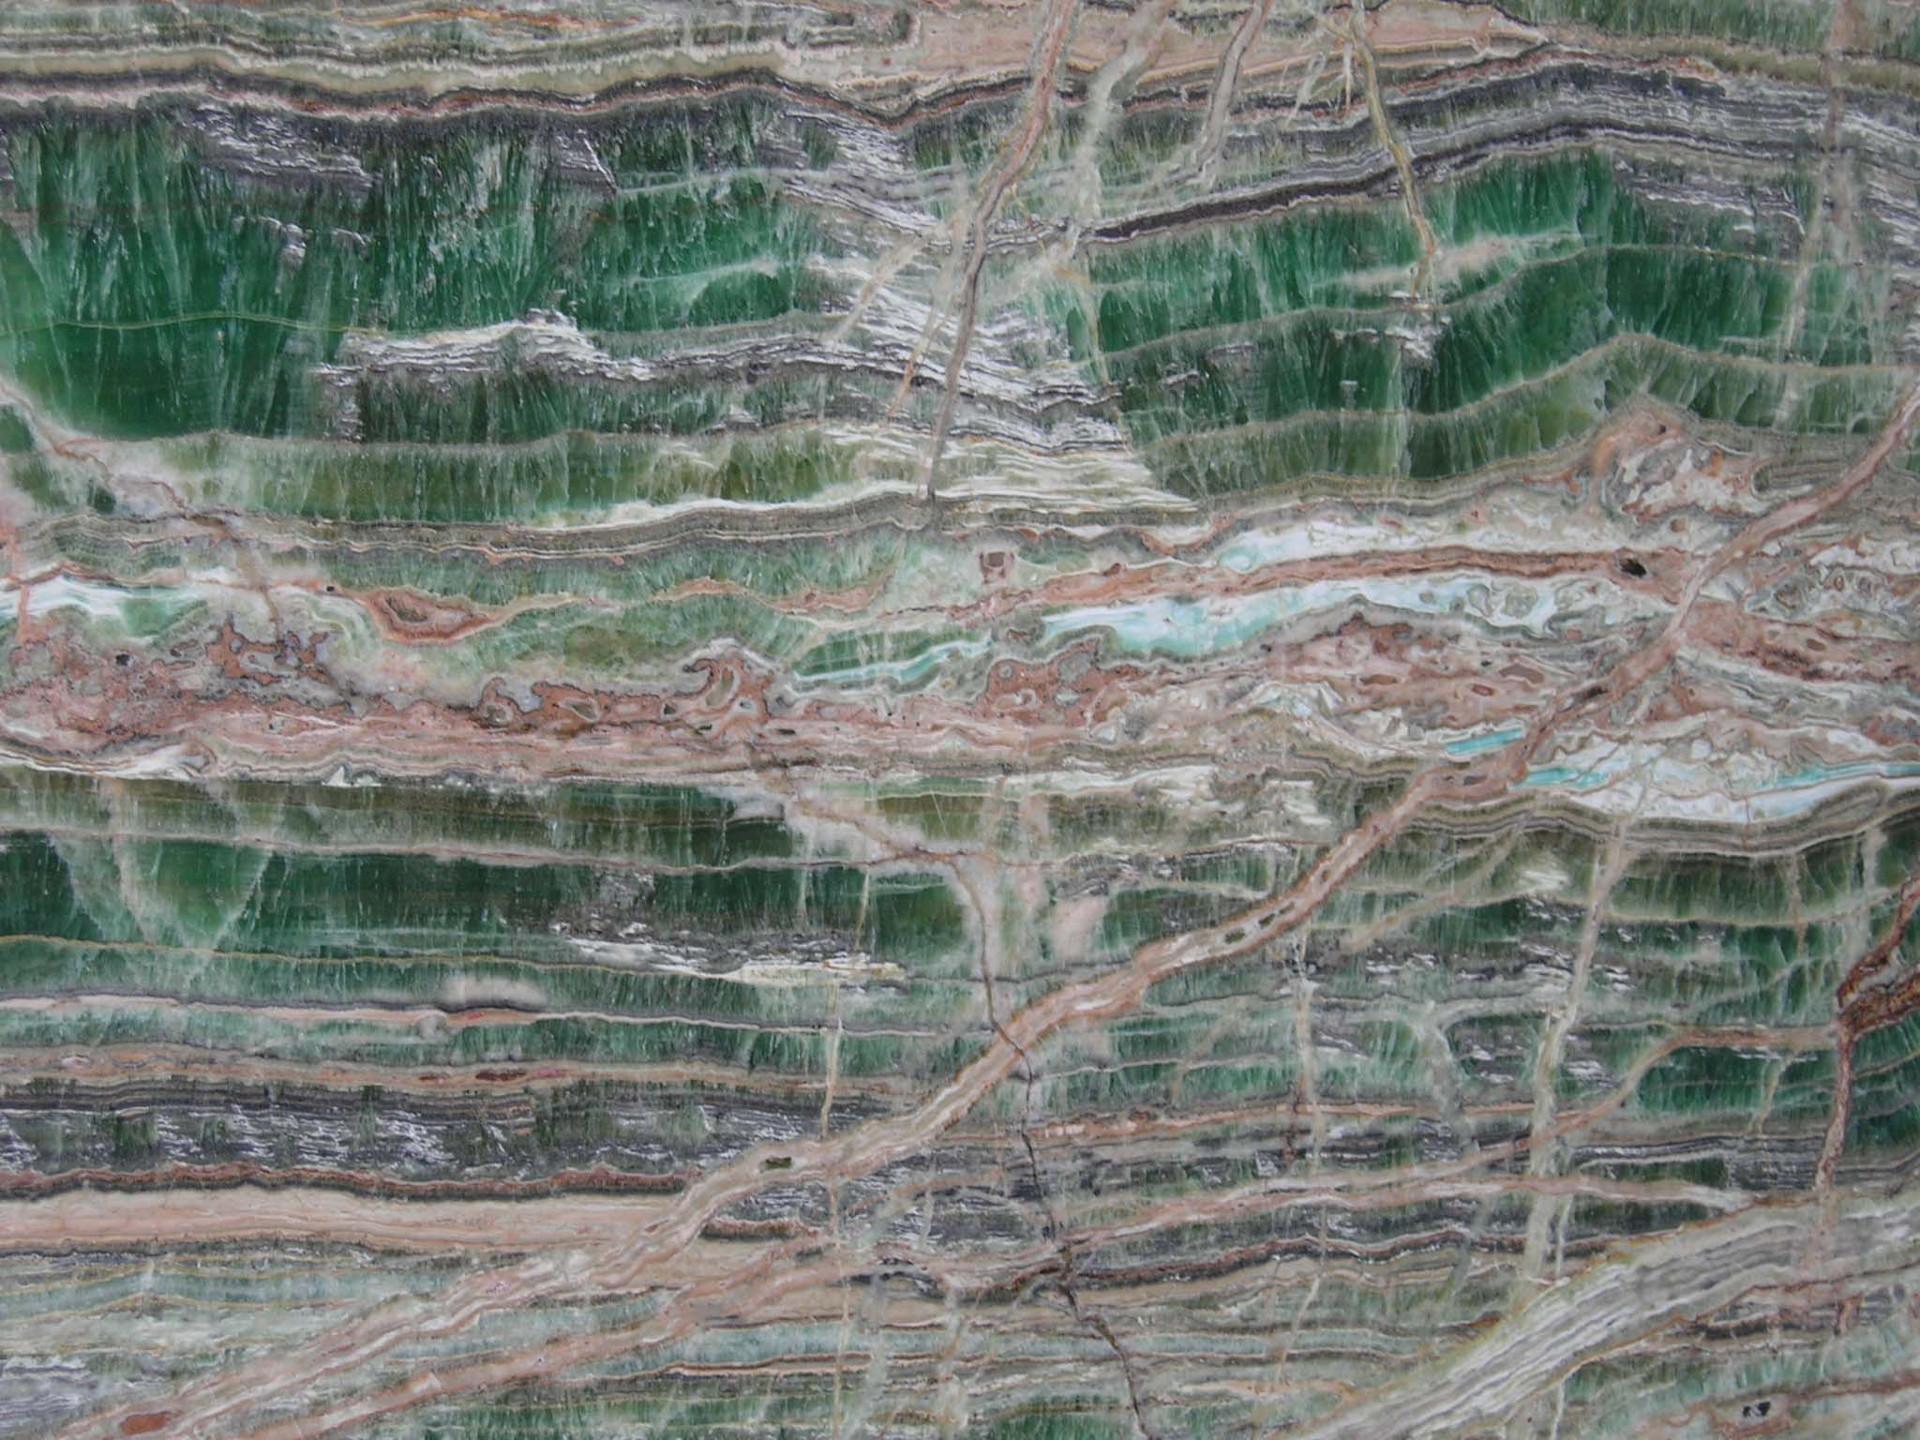 esmeraldo green